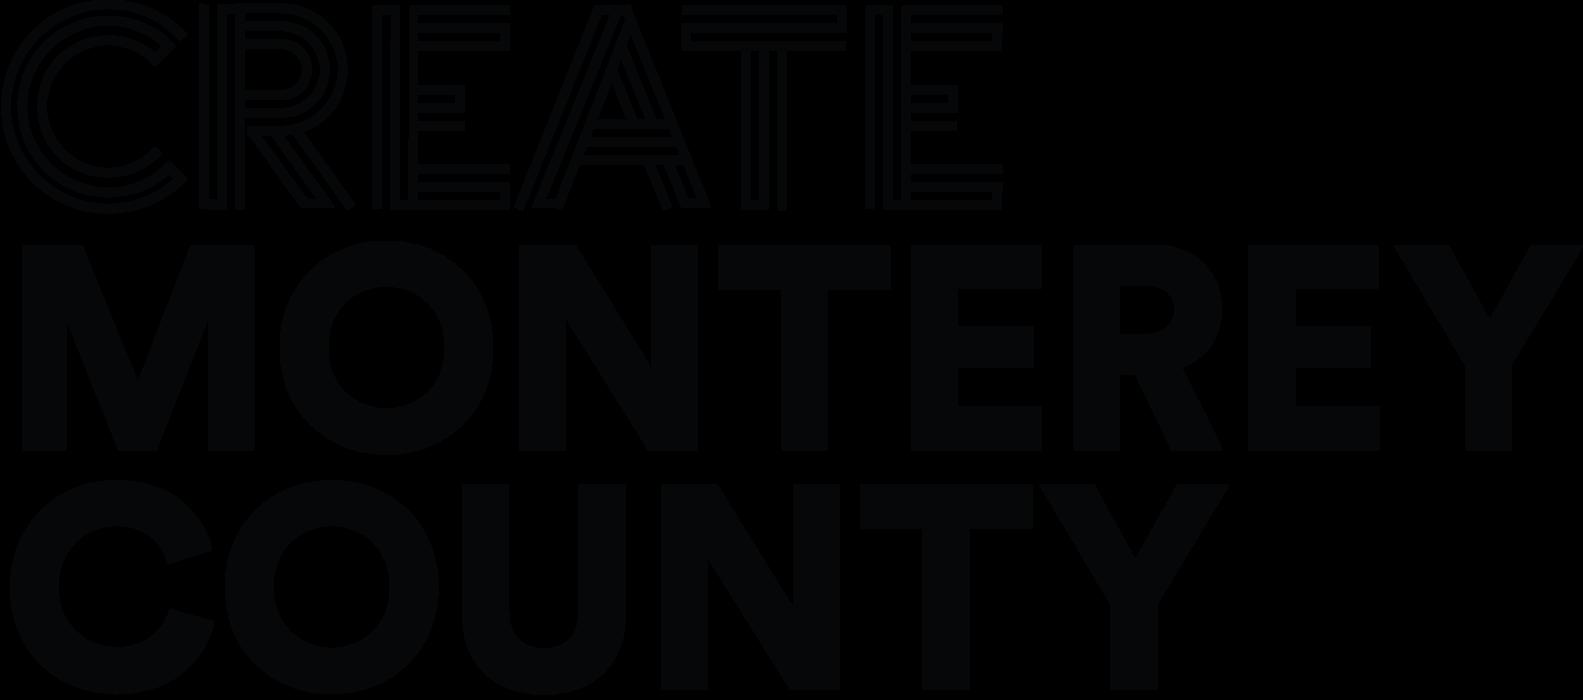 https://secureservercdn.net/198.71.233.51/mgq.552.myftpupload.com/wp-content/uploads/2020/01/Create-Ca-County-Logos-24-e1580494867178.png?time=1586282221